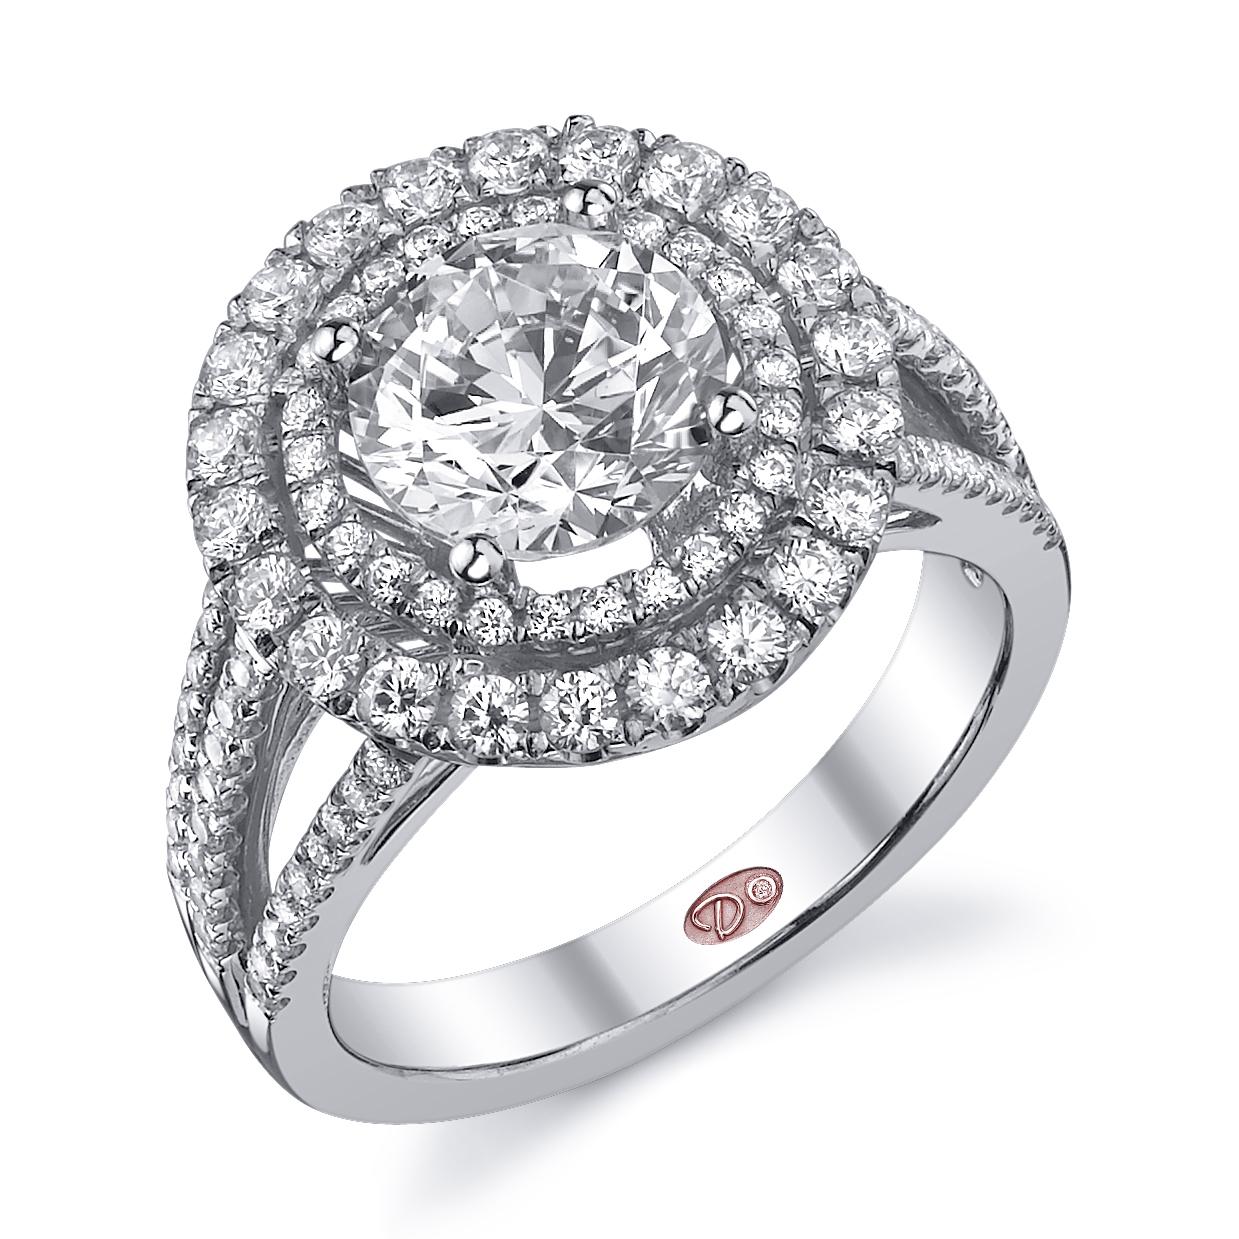 double halo engagement ring halo wedding ring Style DW